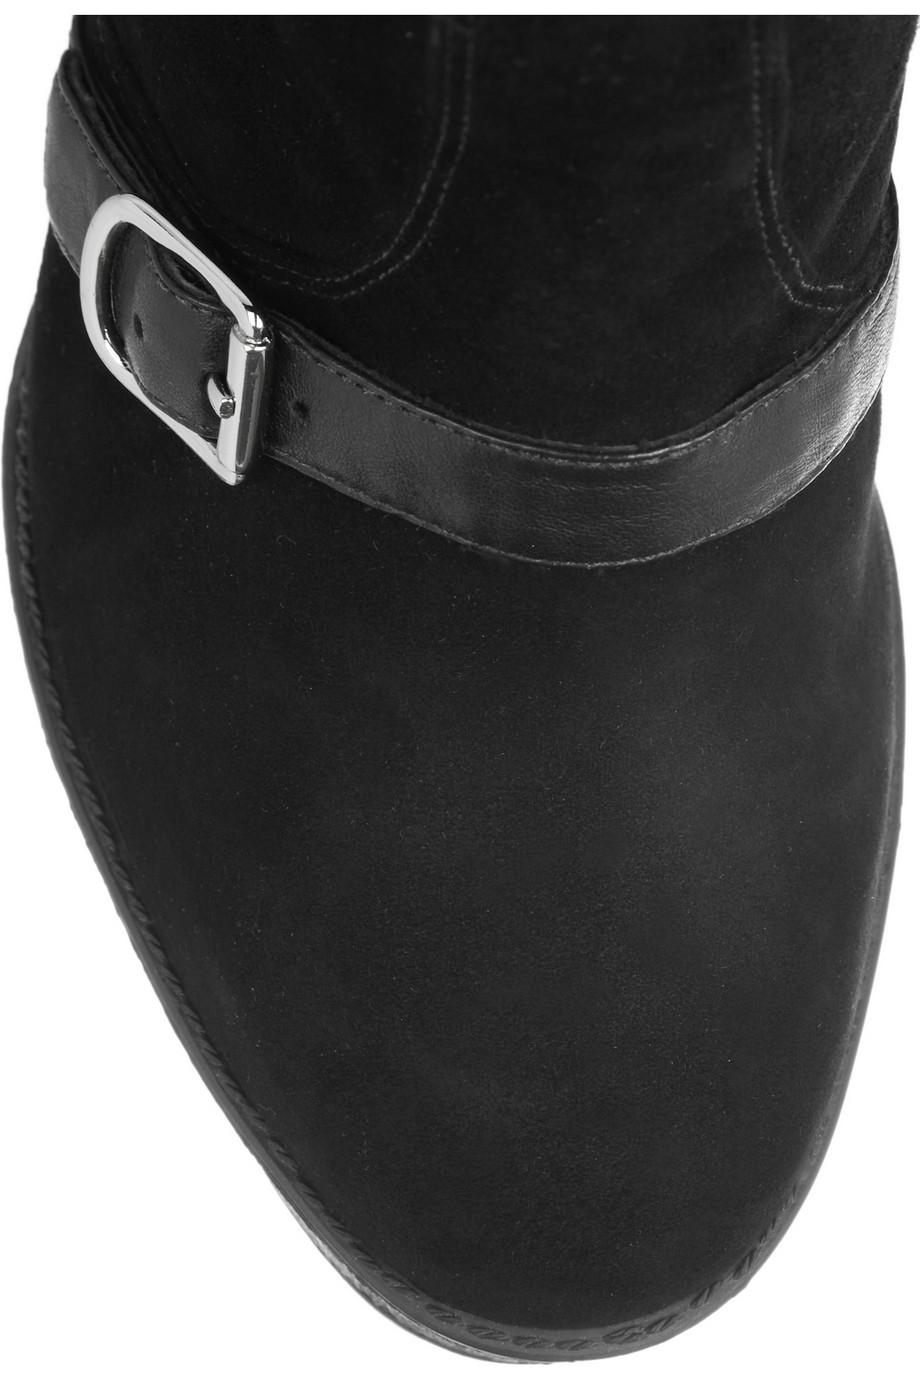 Pour La Victoire Darien Leather-Trimmed Suede Ankle Boots in Black